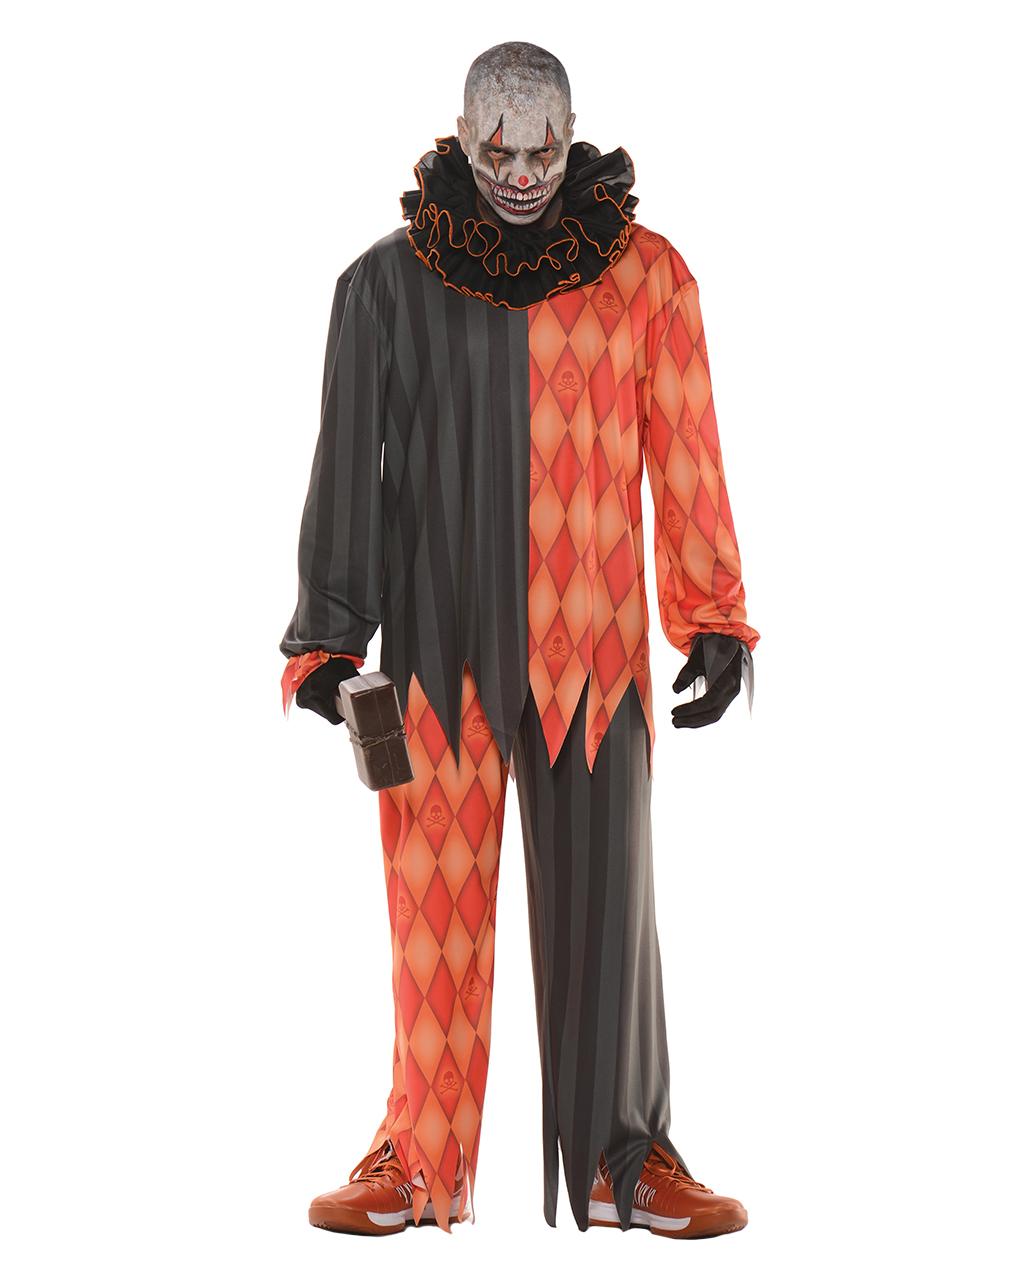 Evil clown costume with ruffled collar für Horror Clowns | horror-shop.com  sc 1 st  Horror-Shop.com & Evil clown costume with ruffled collar für Horror Clowns | horror ...